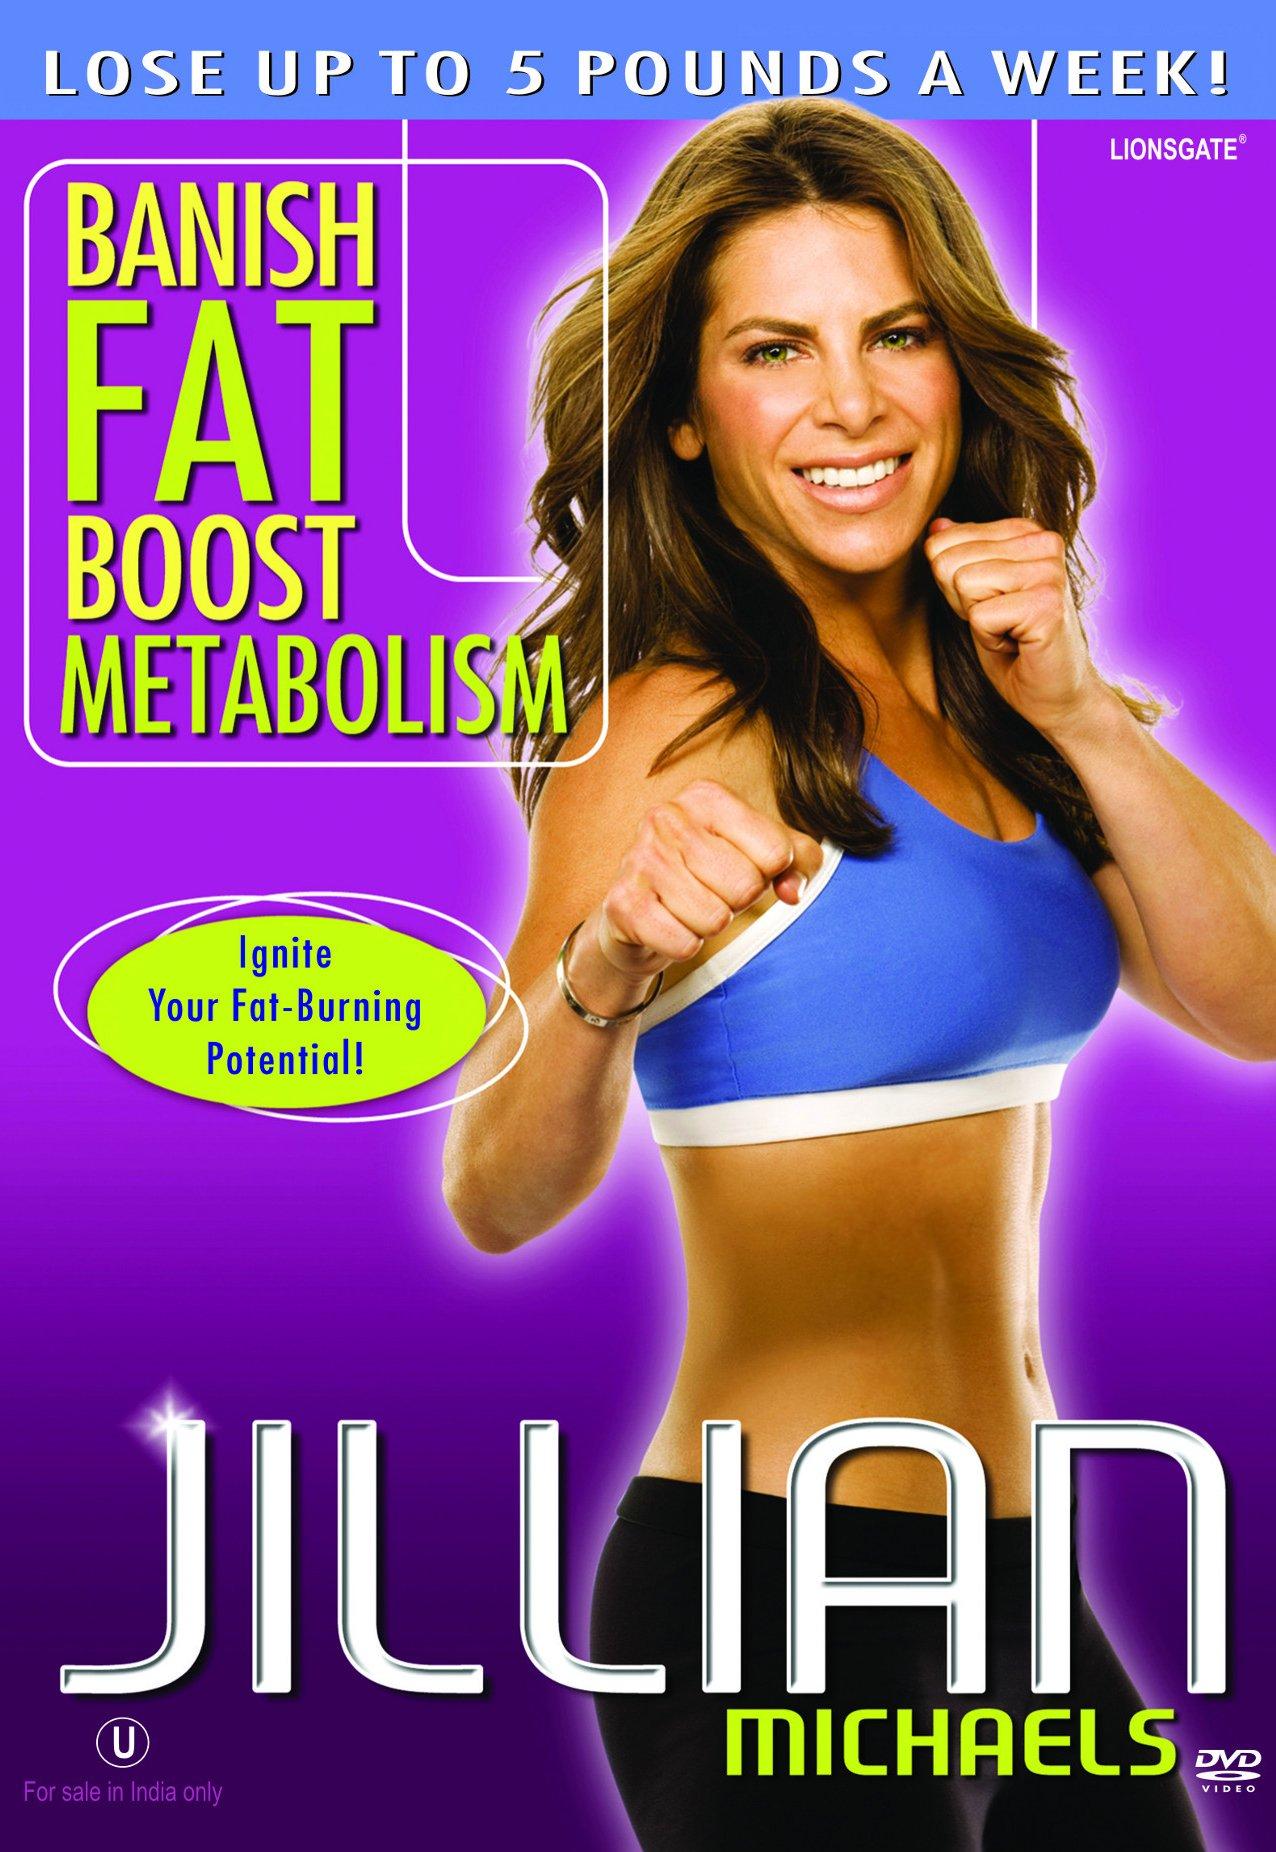 DVD : Jillian Michaels - Banish Fat Boost Metabolism (Full Frame)